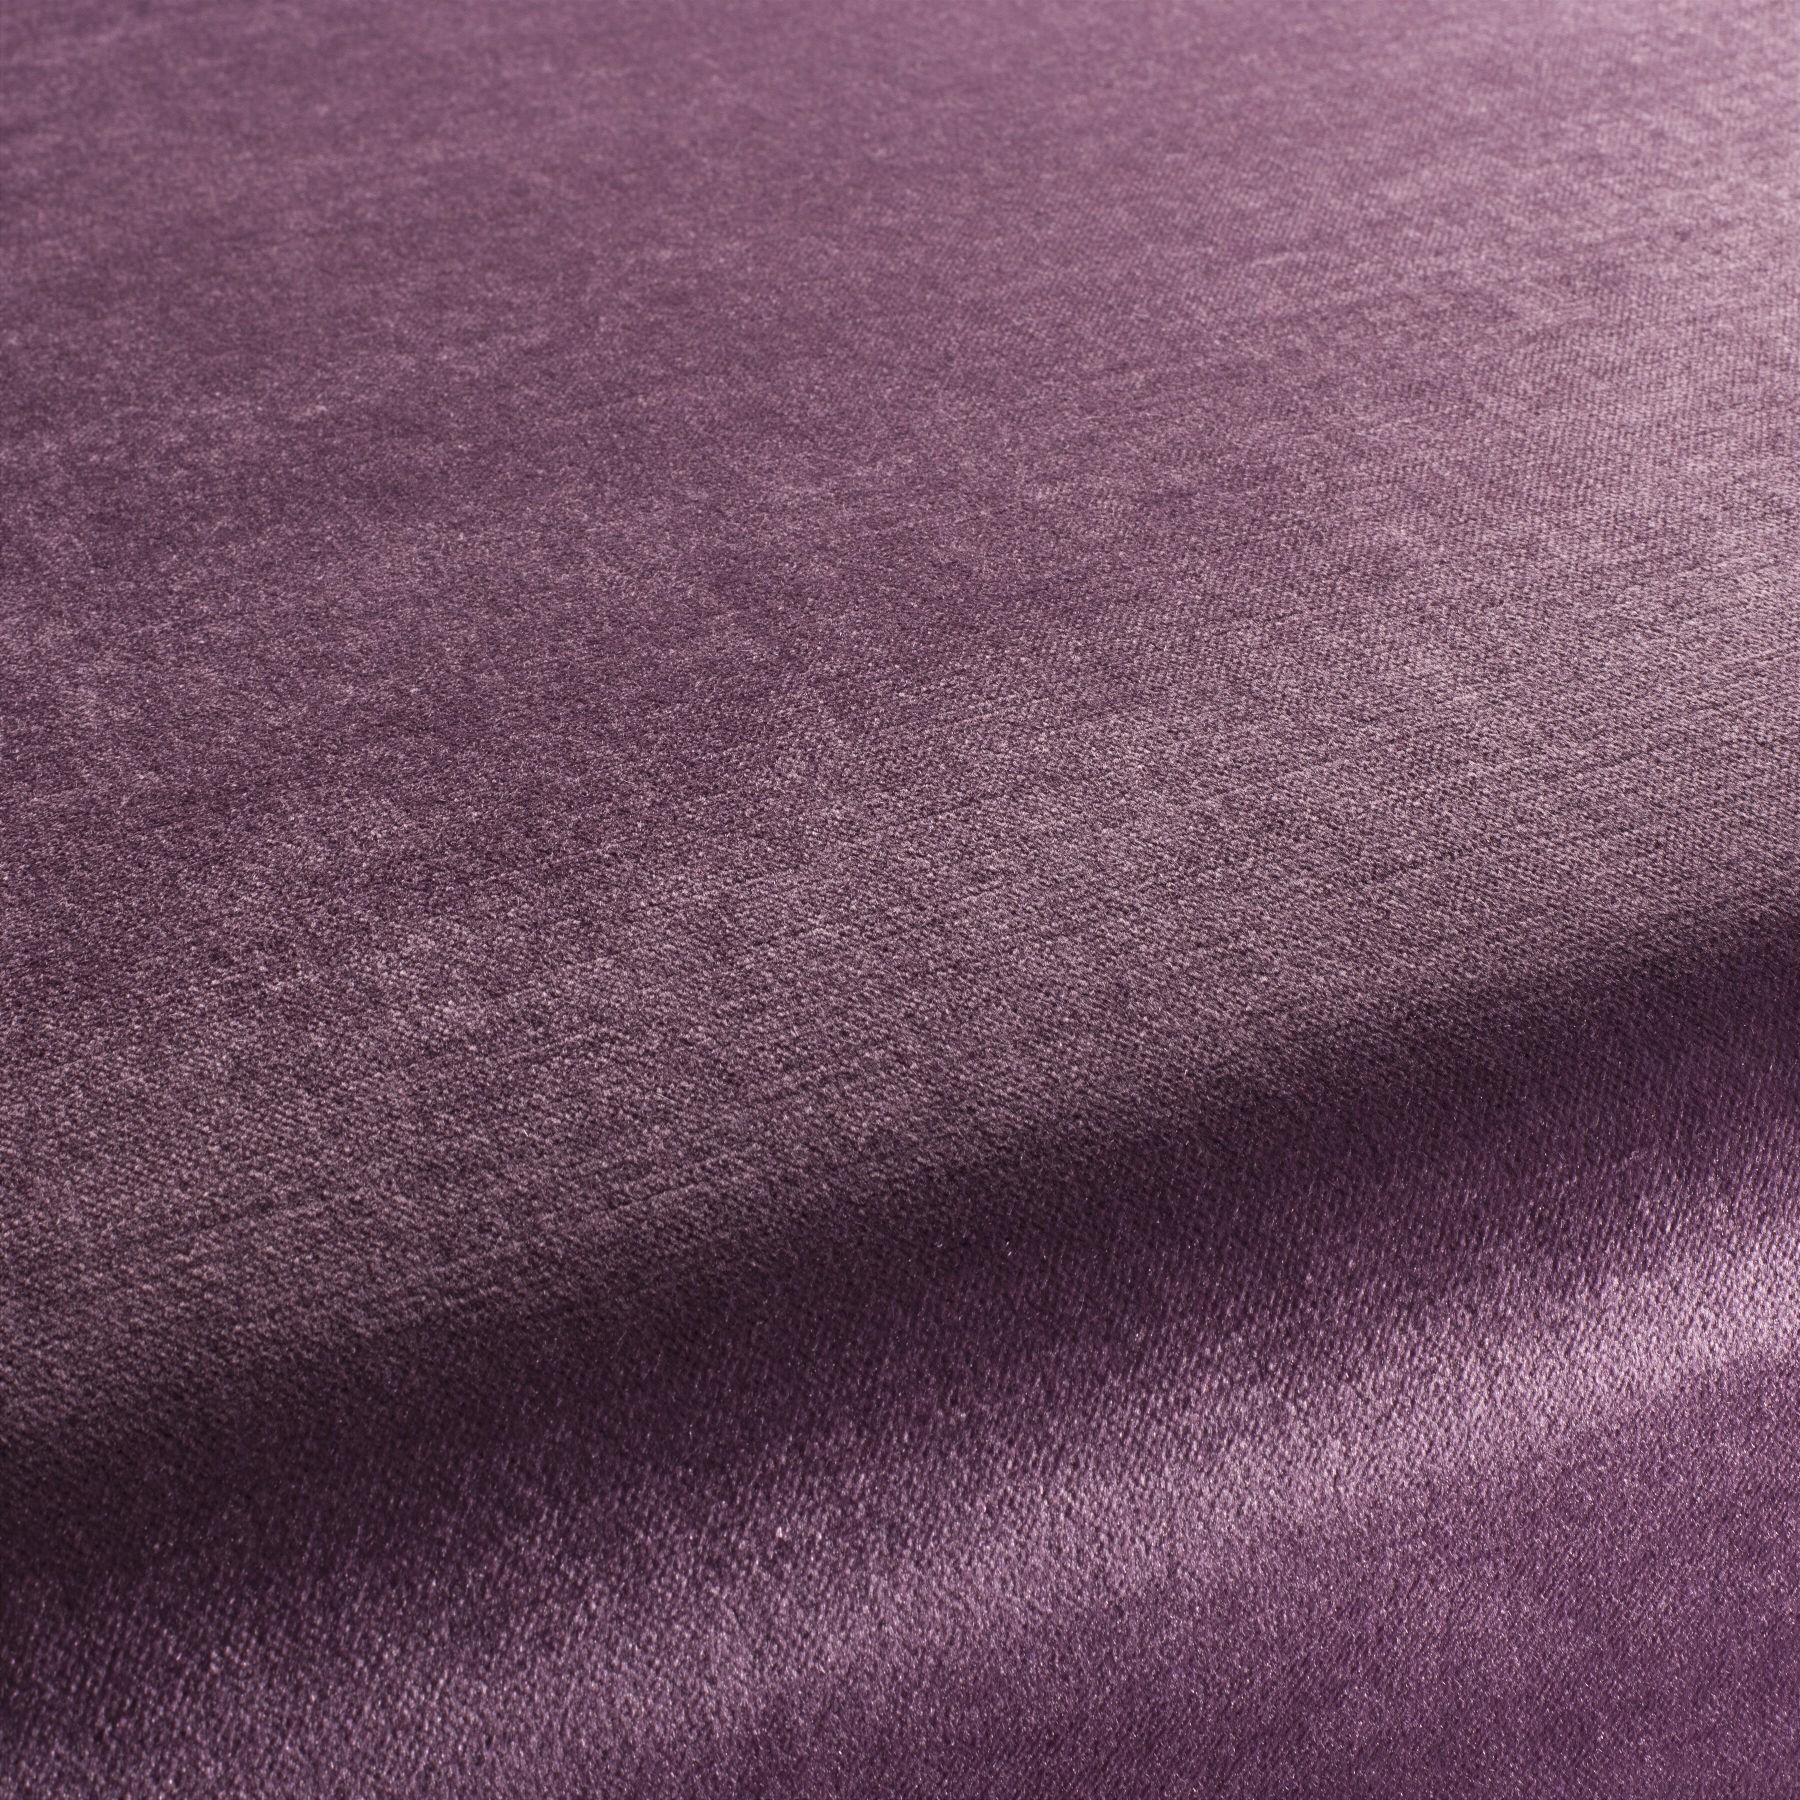 upholstery fabric regent 1 3125 080 jab anstoetz fabrics. Black Bedroom Furniture Sets. Home Design Ideas